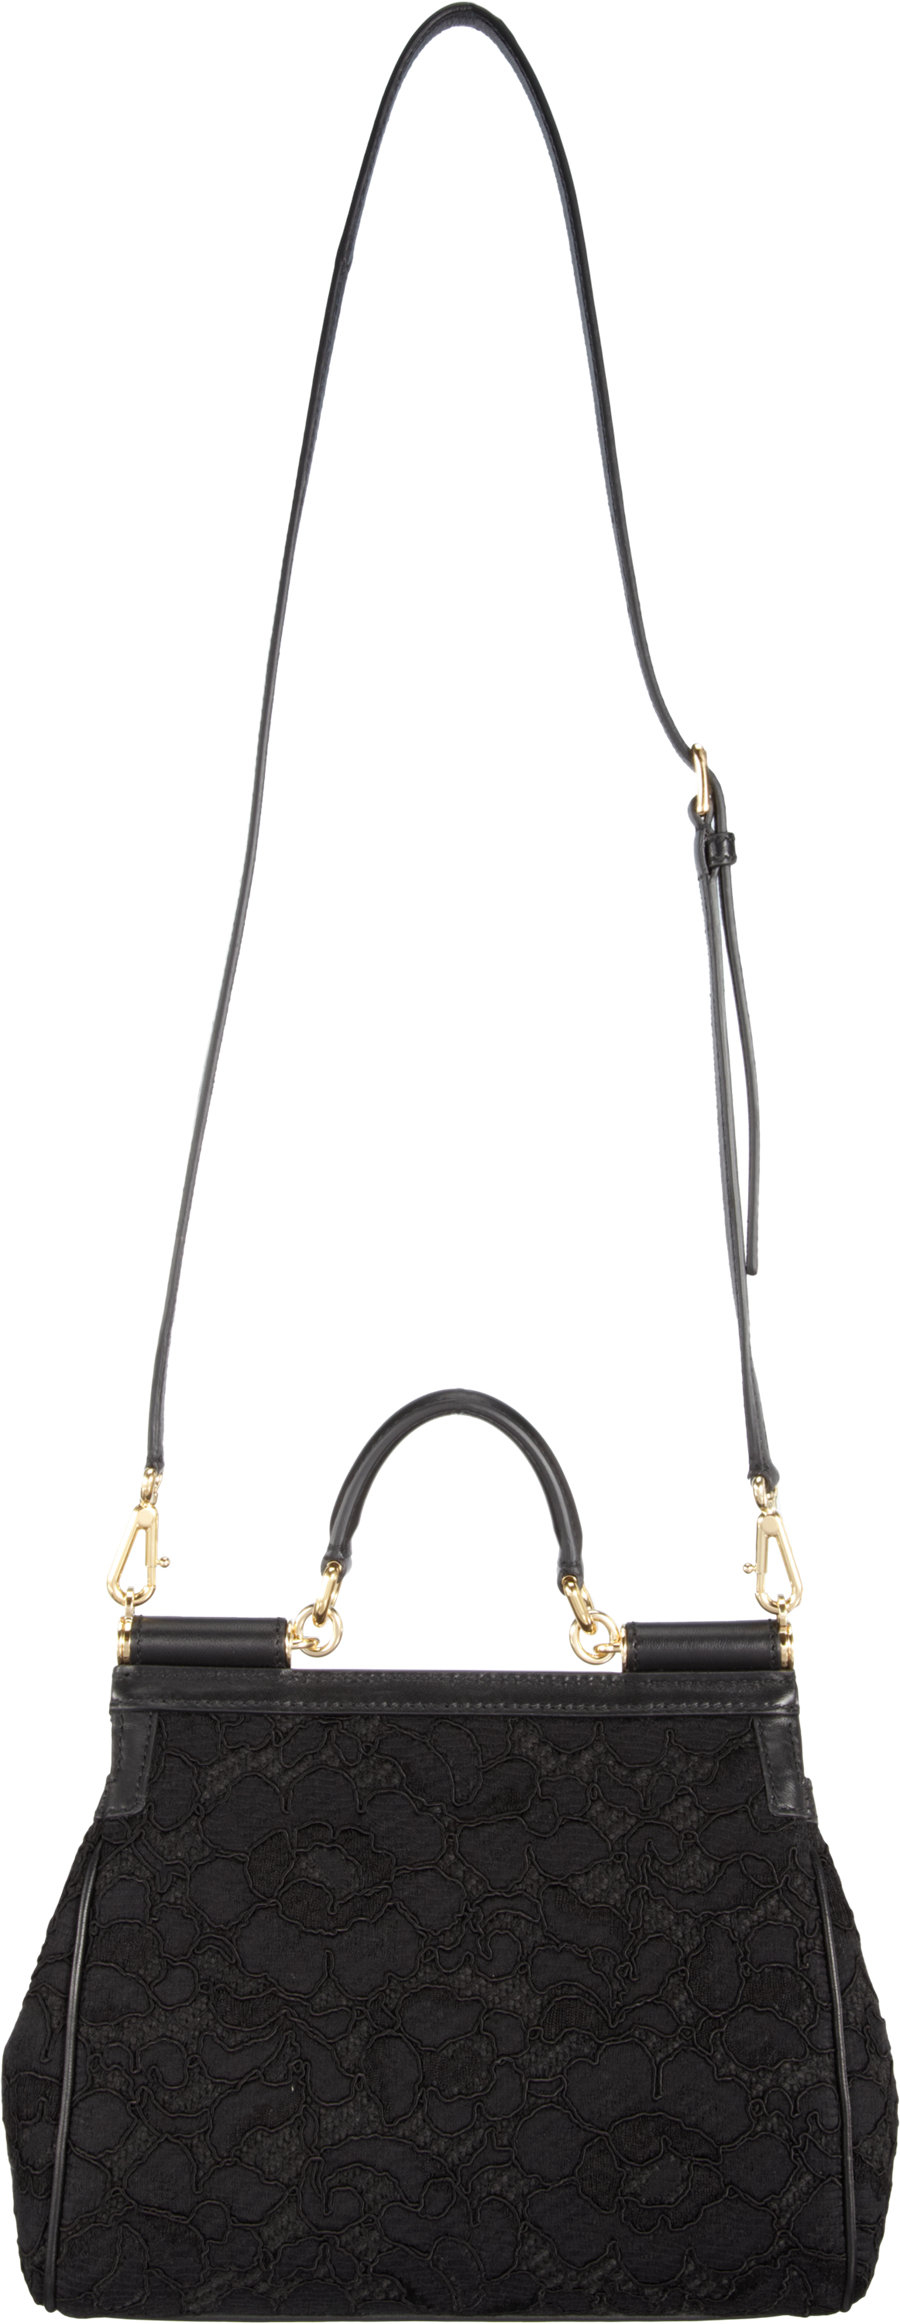 acbb26833b4a Dolce   Gabbana Lace Miss Sicily Bag in Black - Lyst